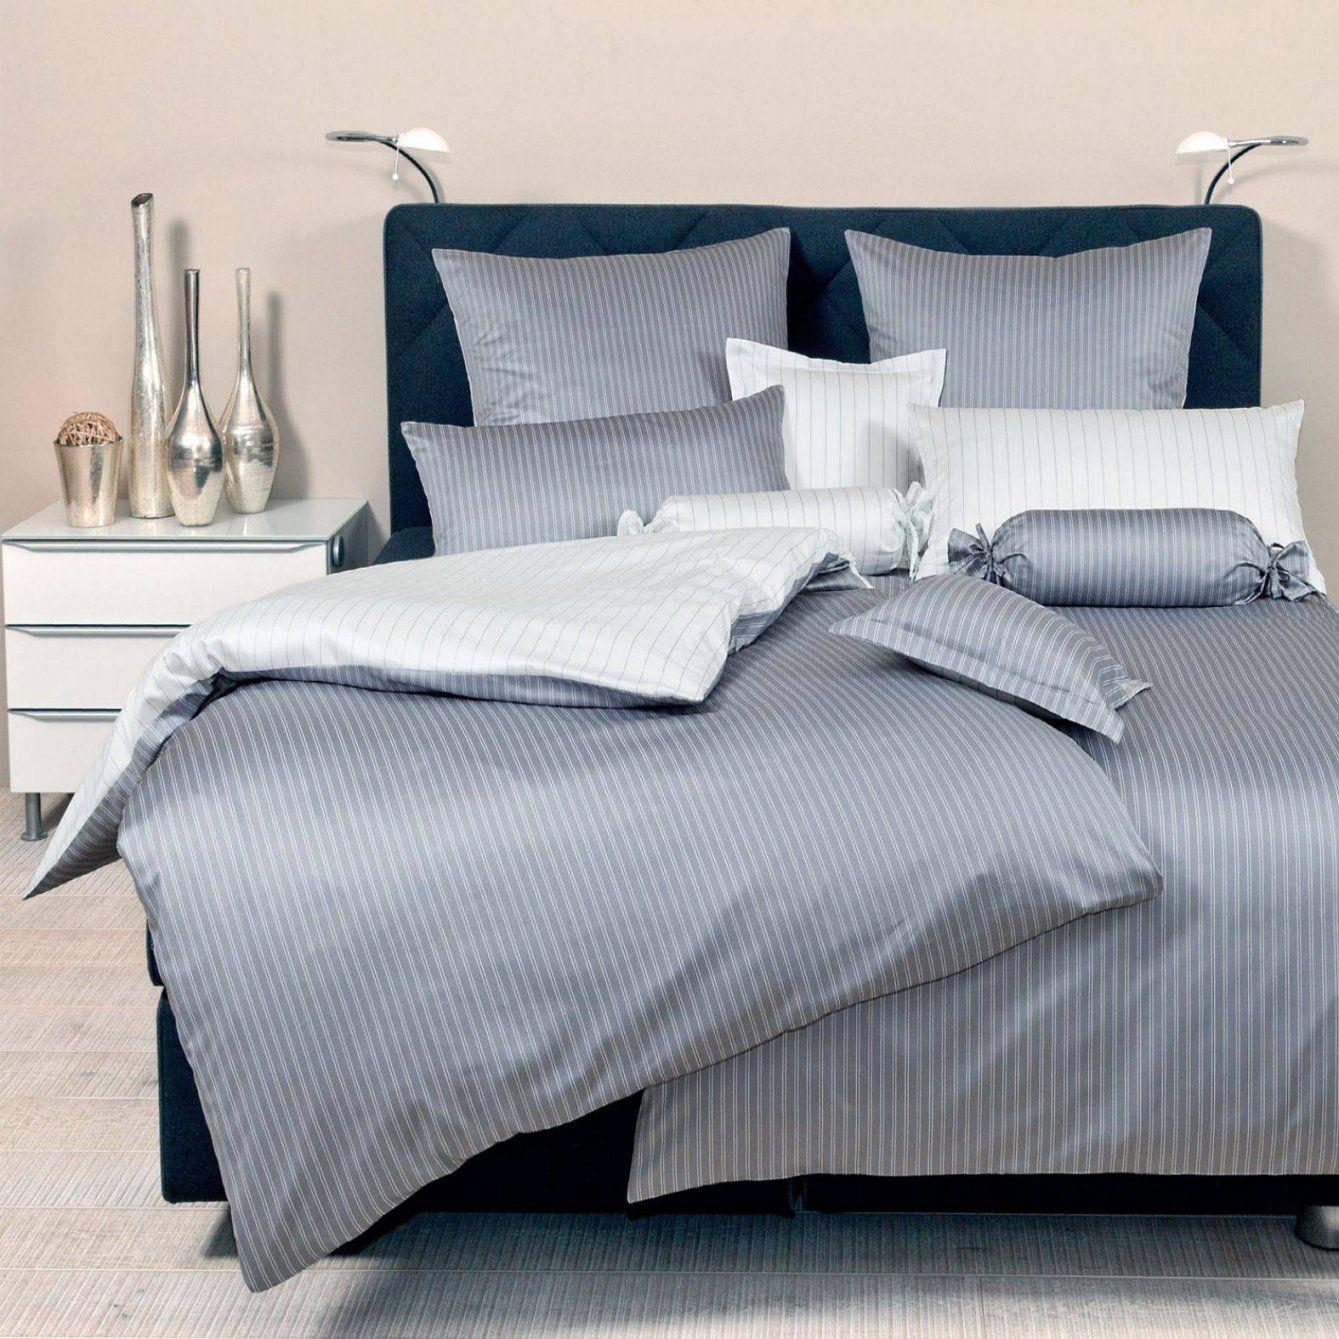 bettw sche 200x220 aldi haus design ideen. Black Bedroom Furniture Sets. Home Design Ideas